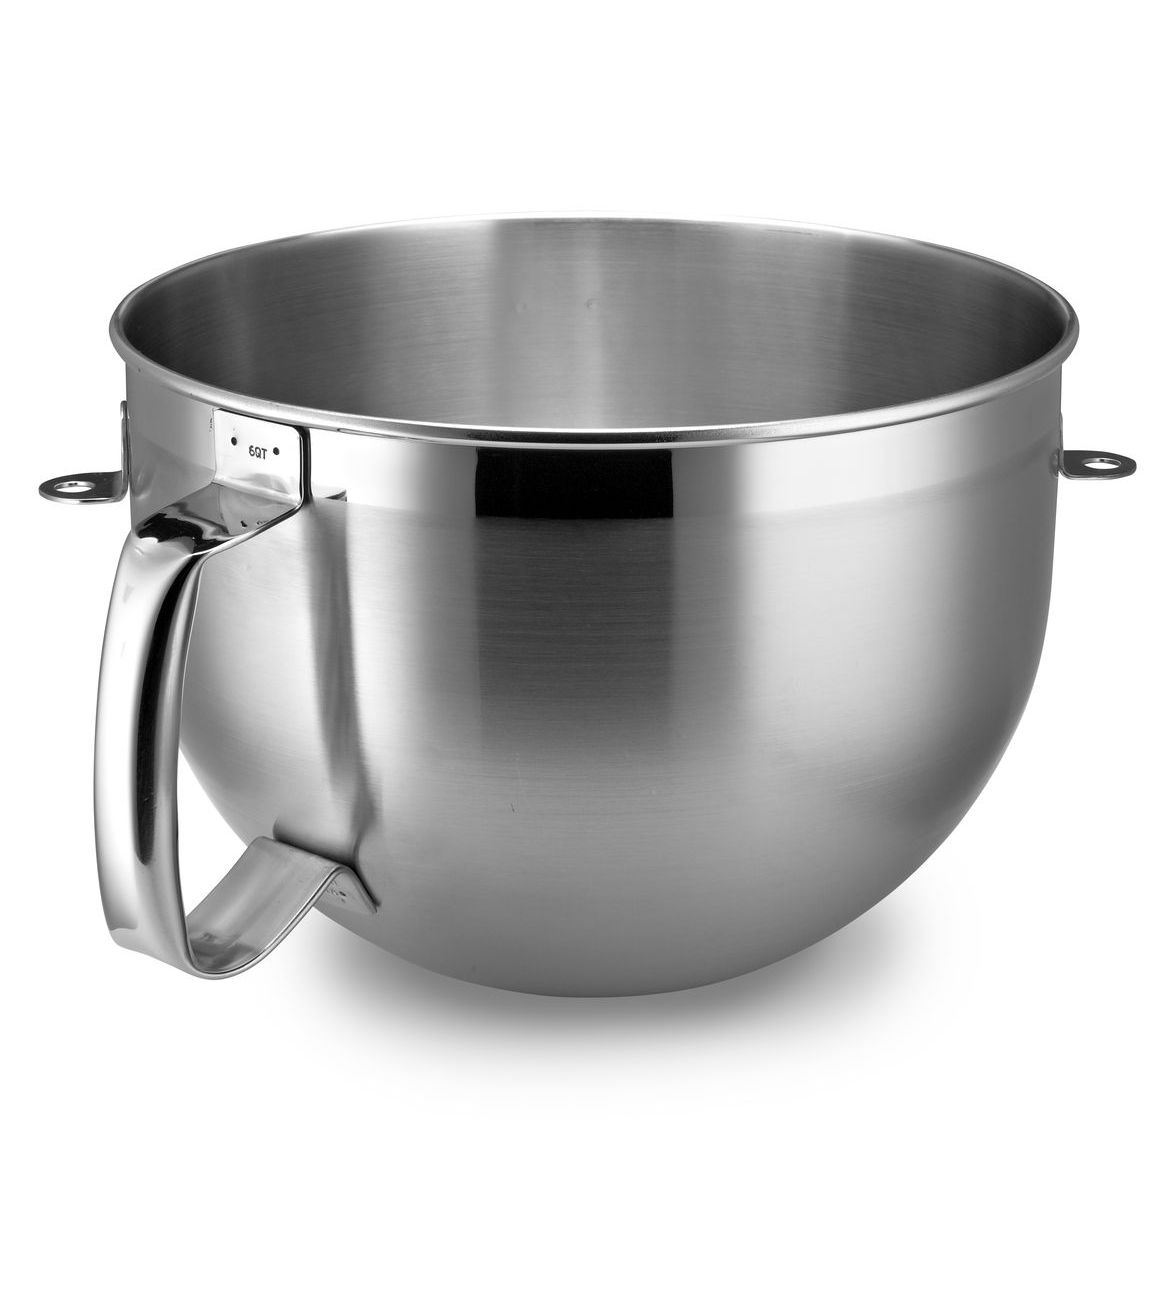 10 Photos To Replacement Bowl For Kitchenaid Mixer